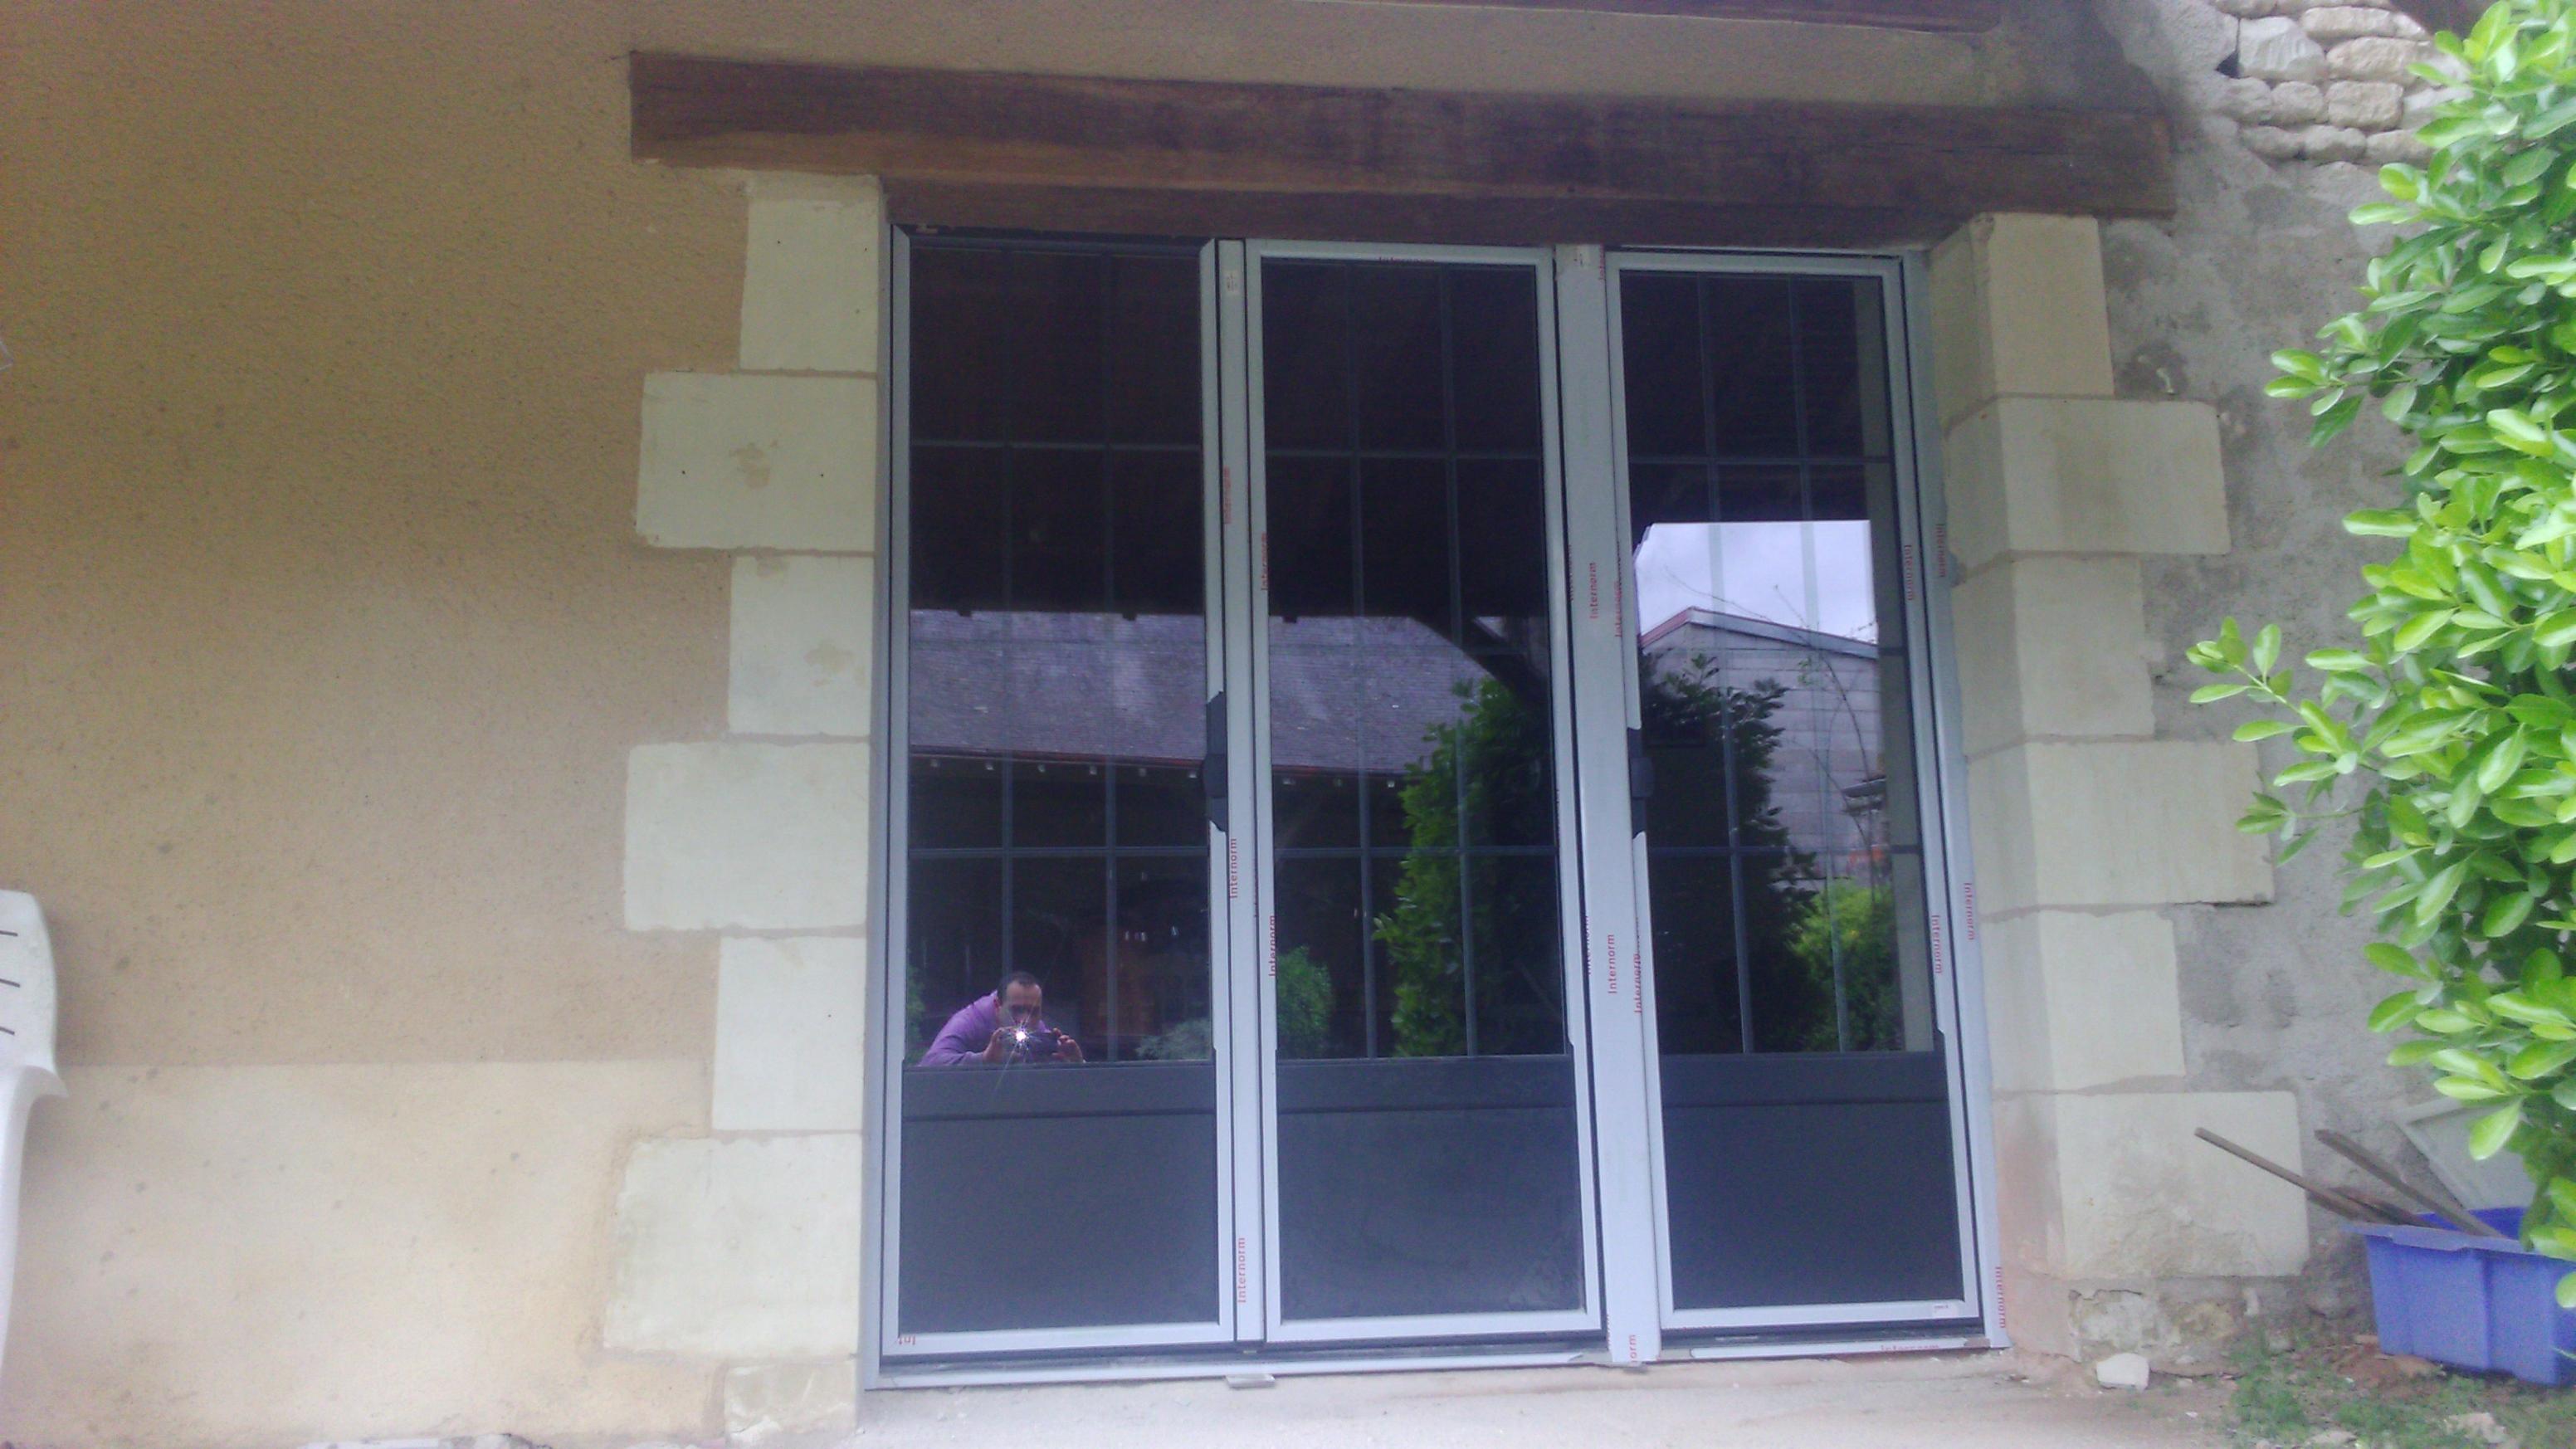 Porte fenêtre 3 Vantaux INTERNORM Ra